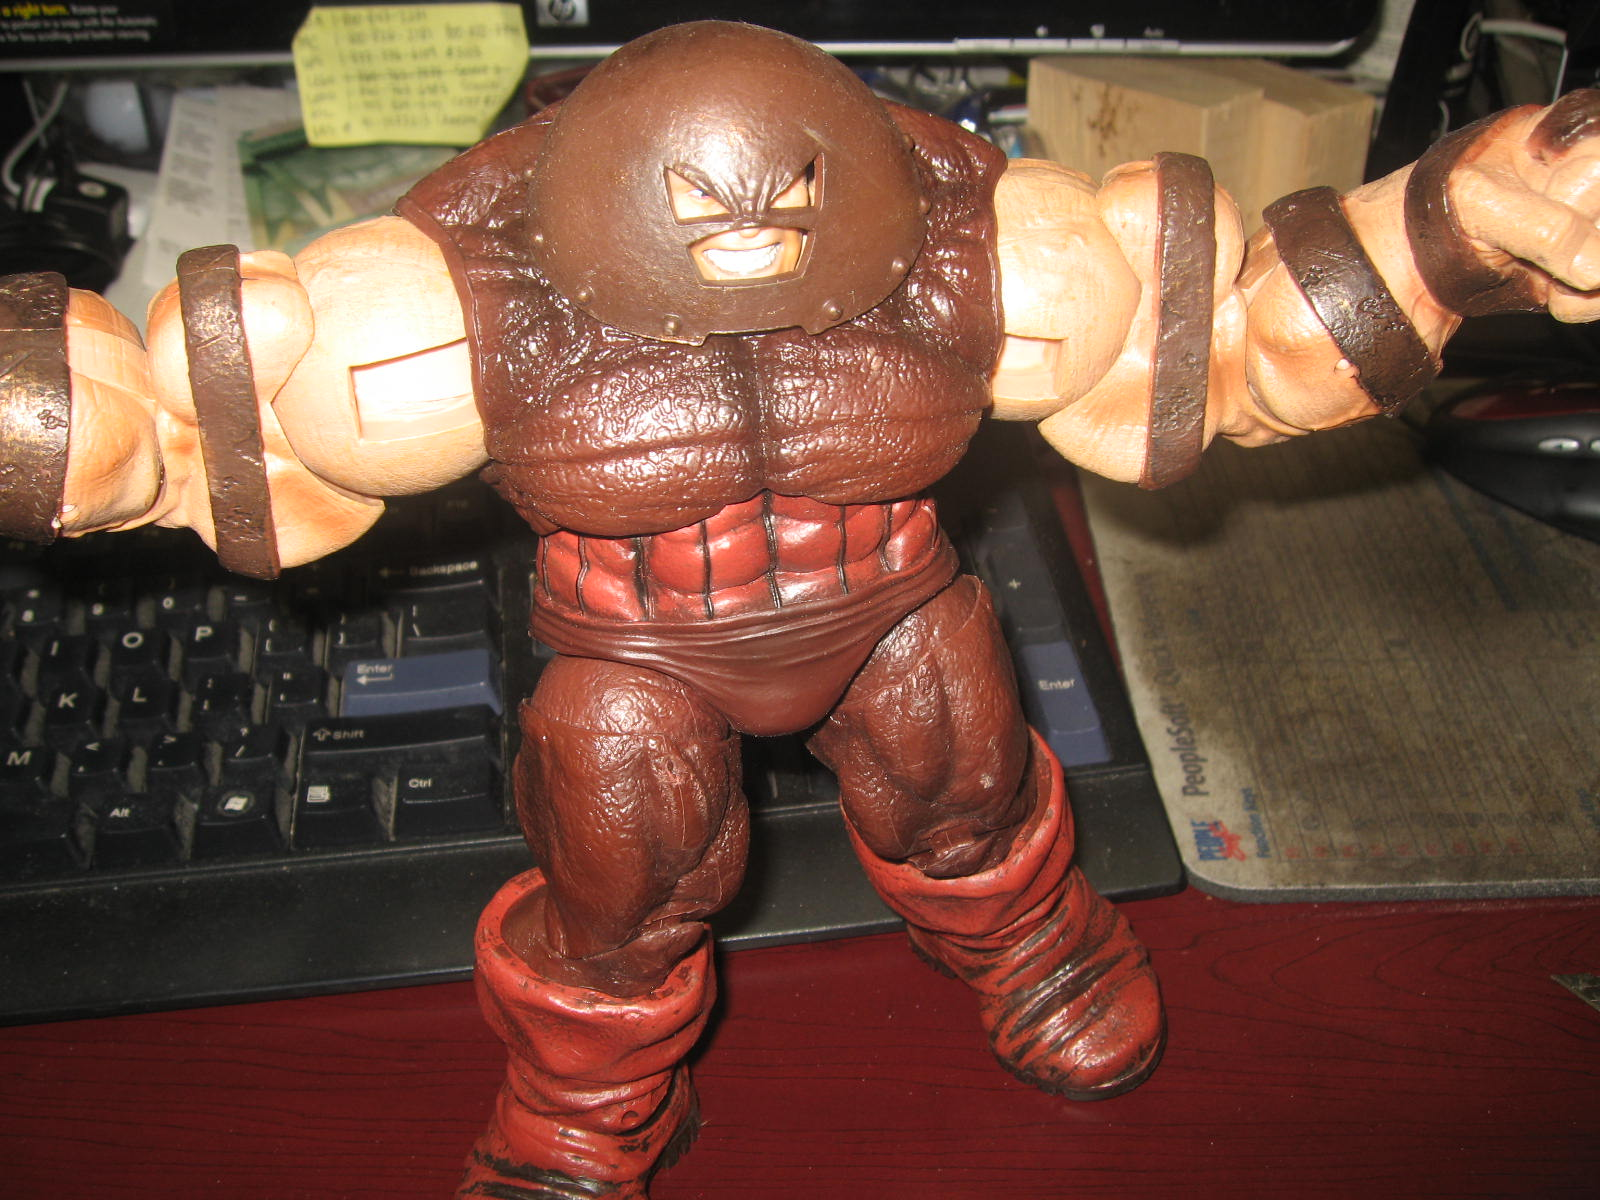 Great Wallpaper Marvel Juggernaut - juggernaut-marvel-select-figure-5a  Image_11569.jpg